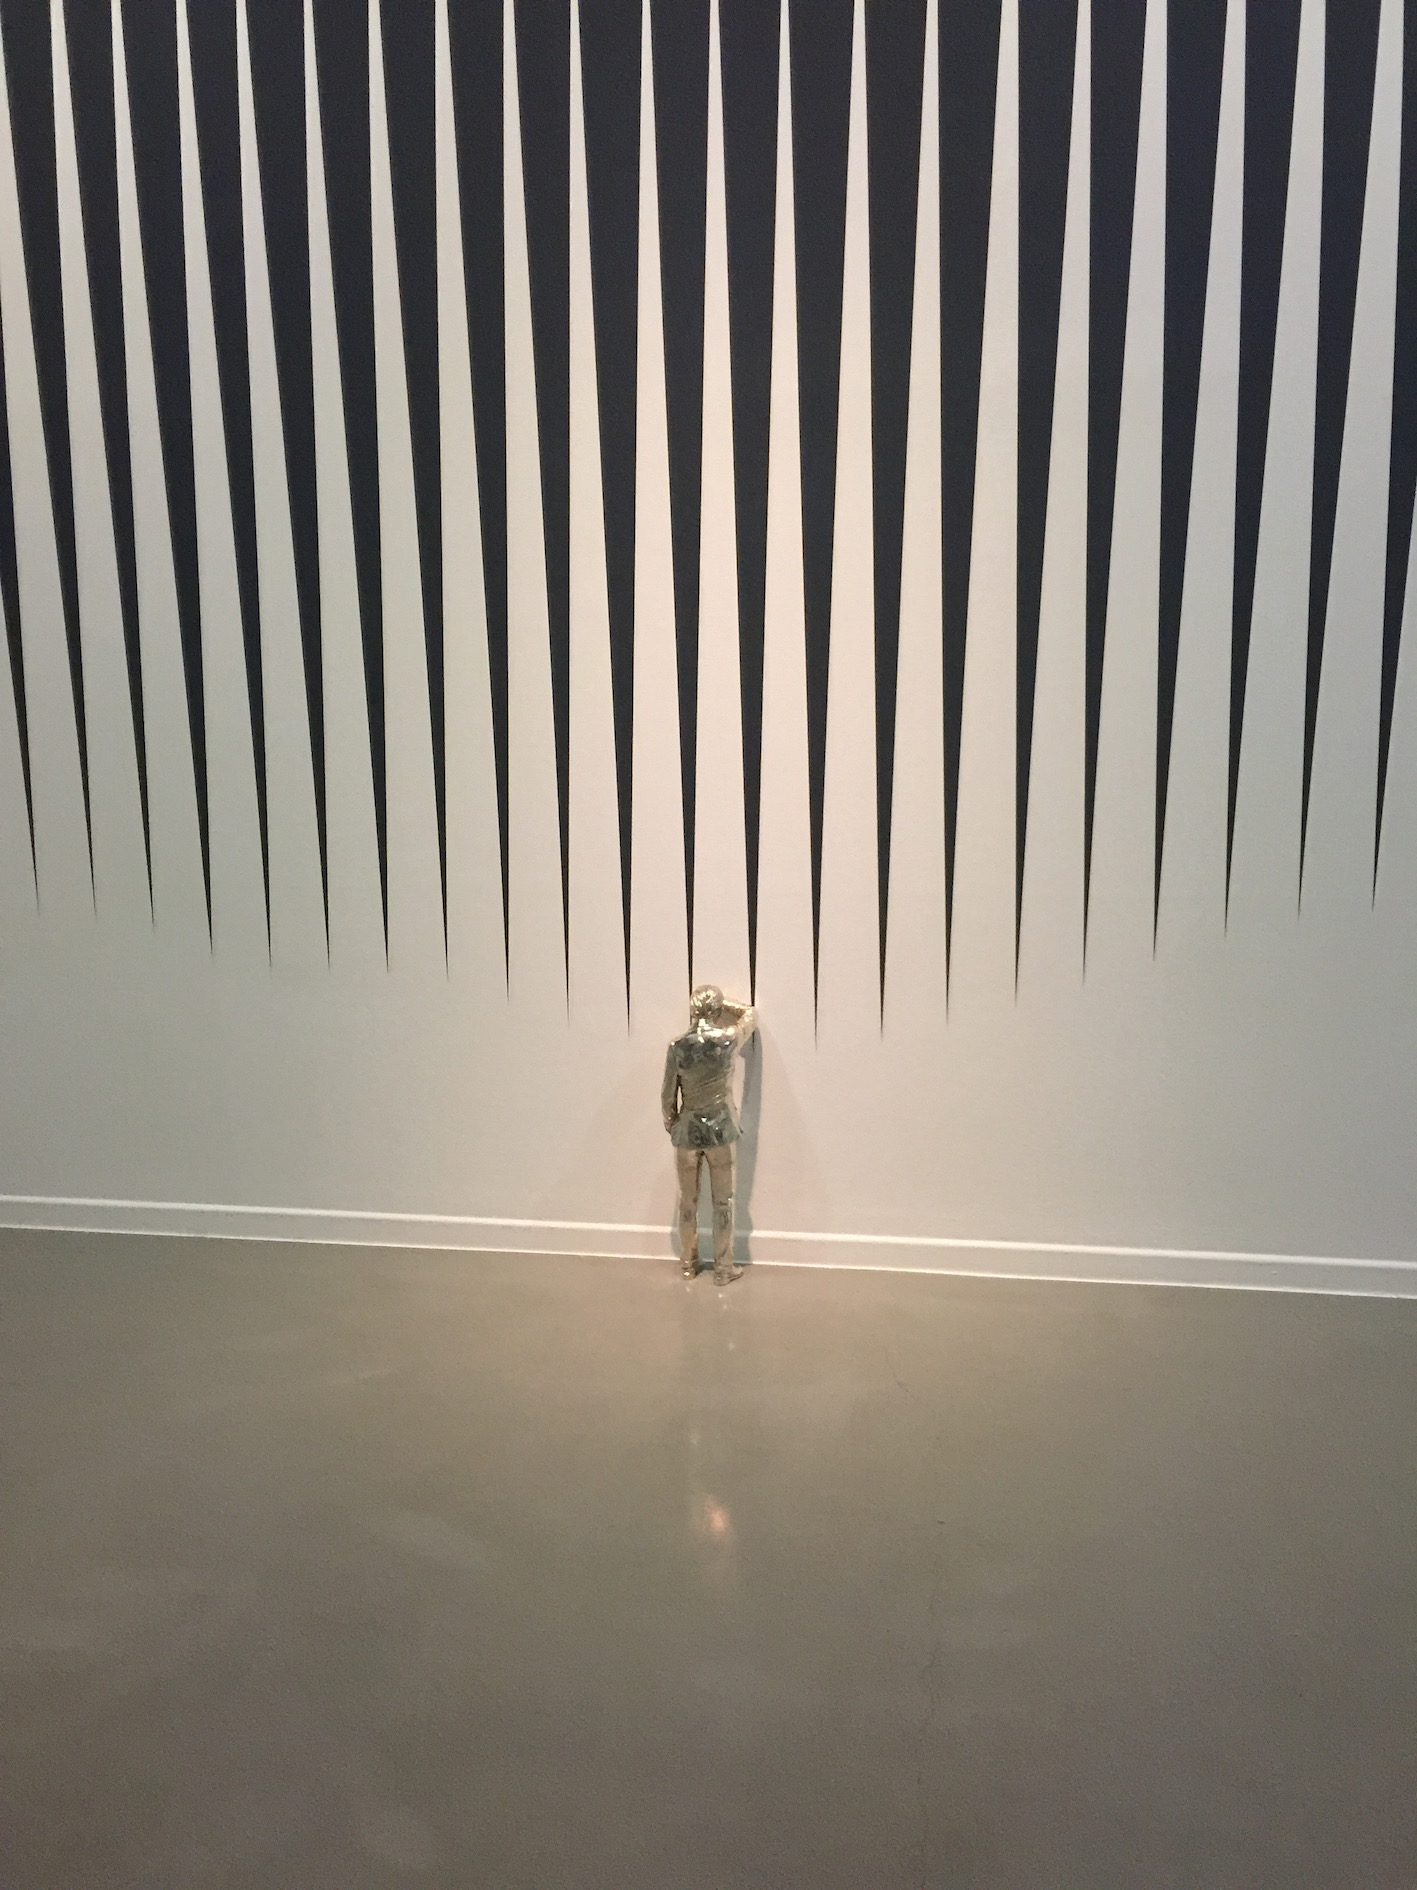 Gonzalo Lebrija - Measuring the distance